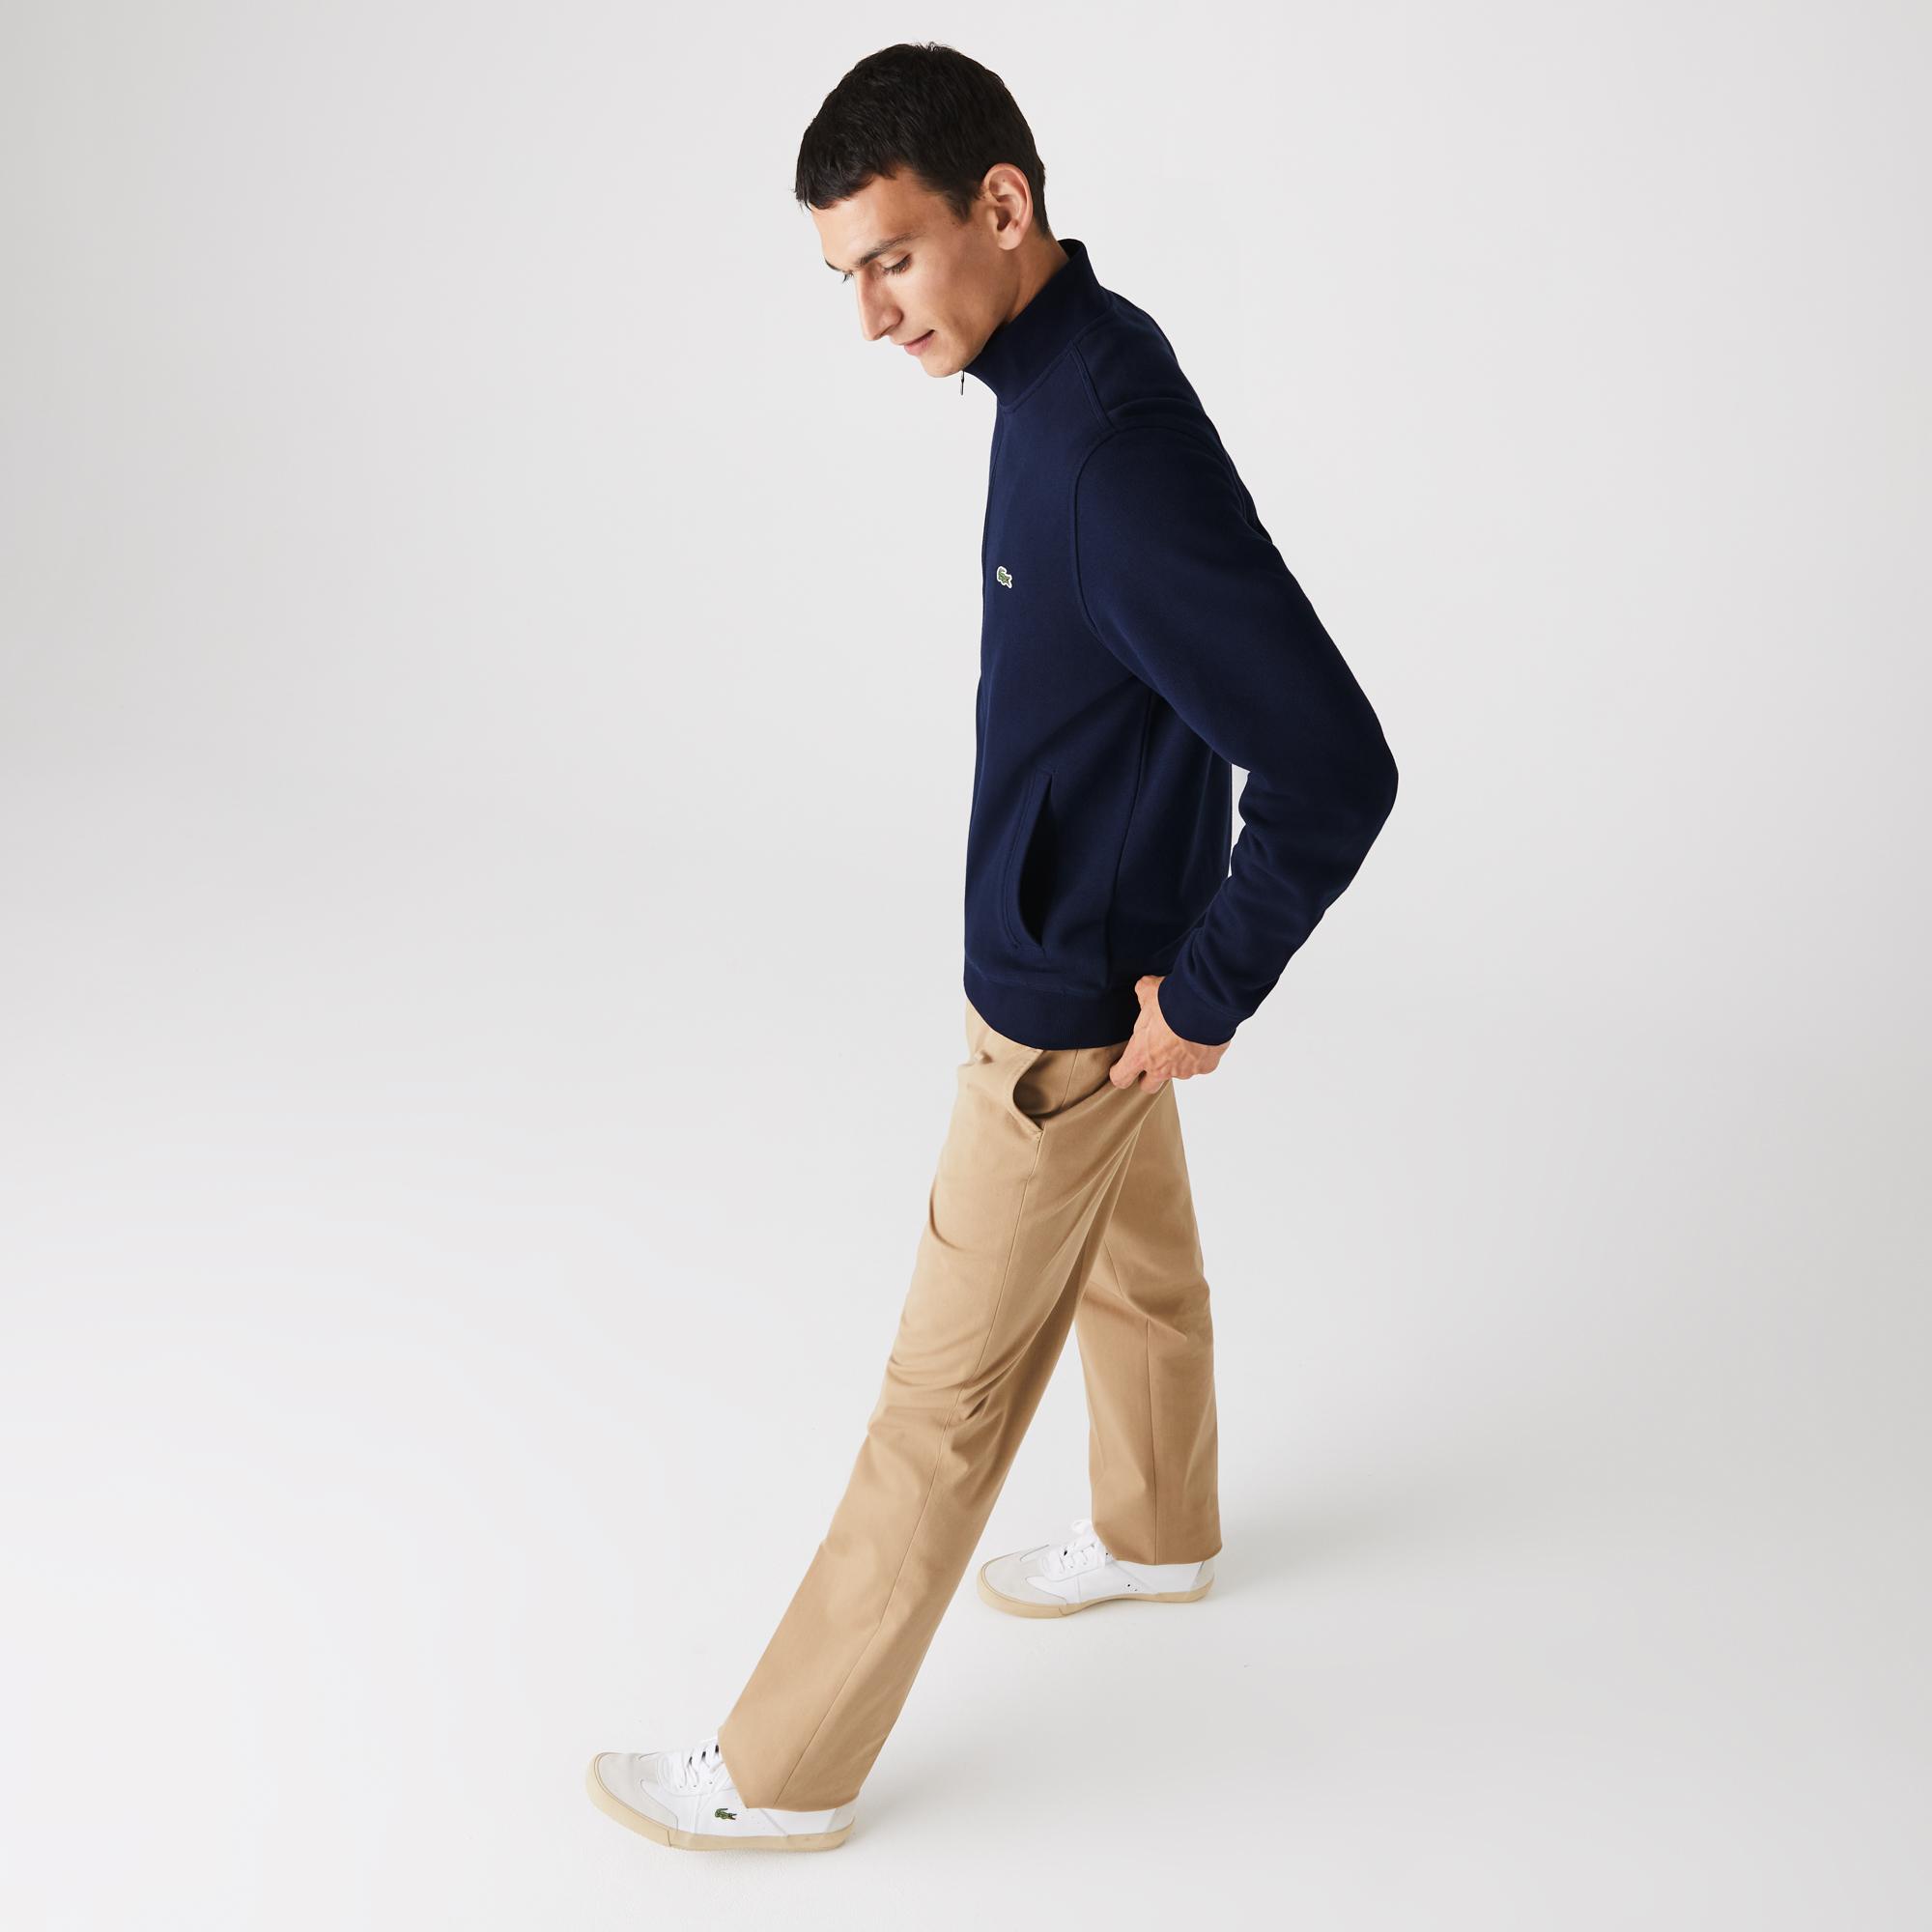 Lacoste Men's Zippered Stand-Up Collar Piqué Fleece Jacket